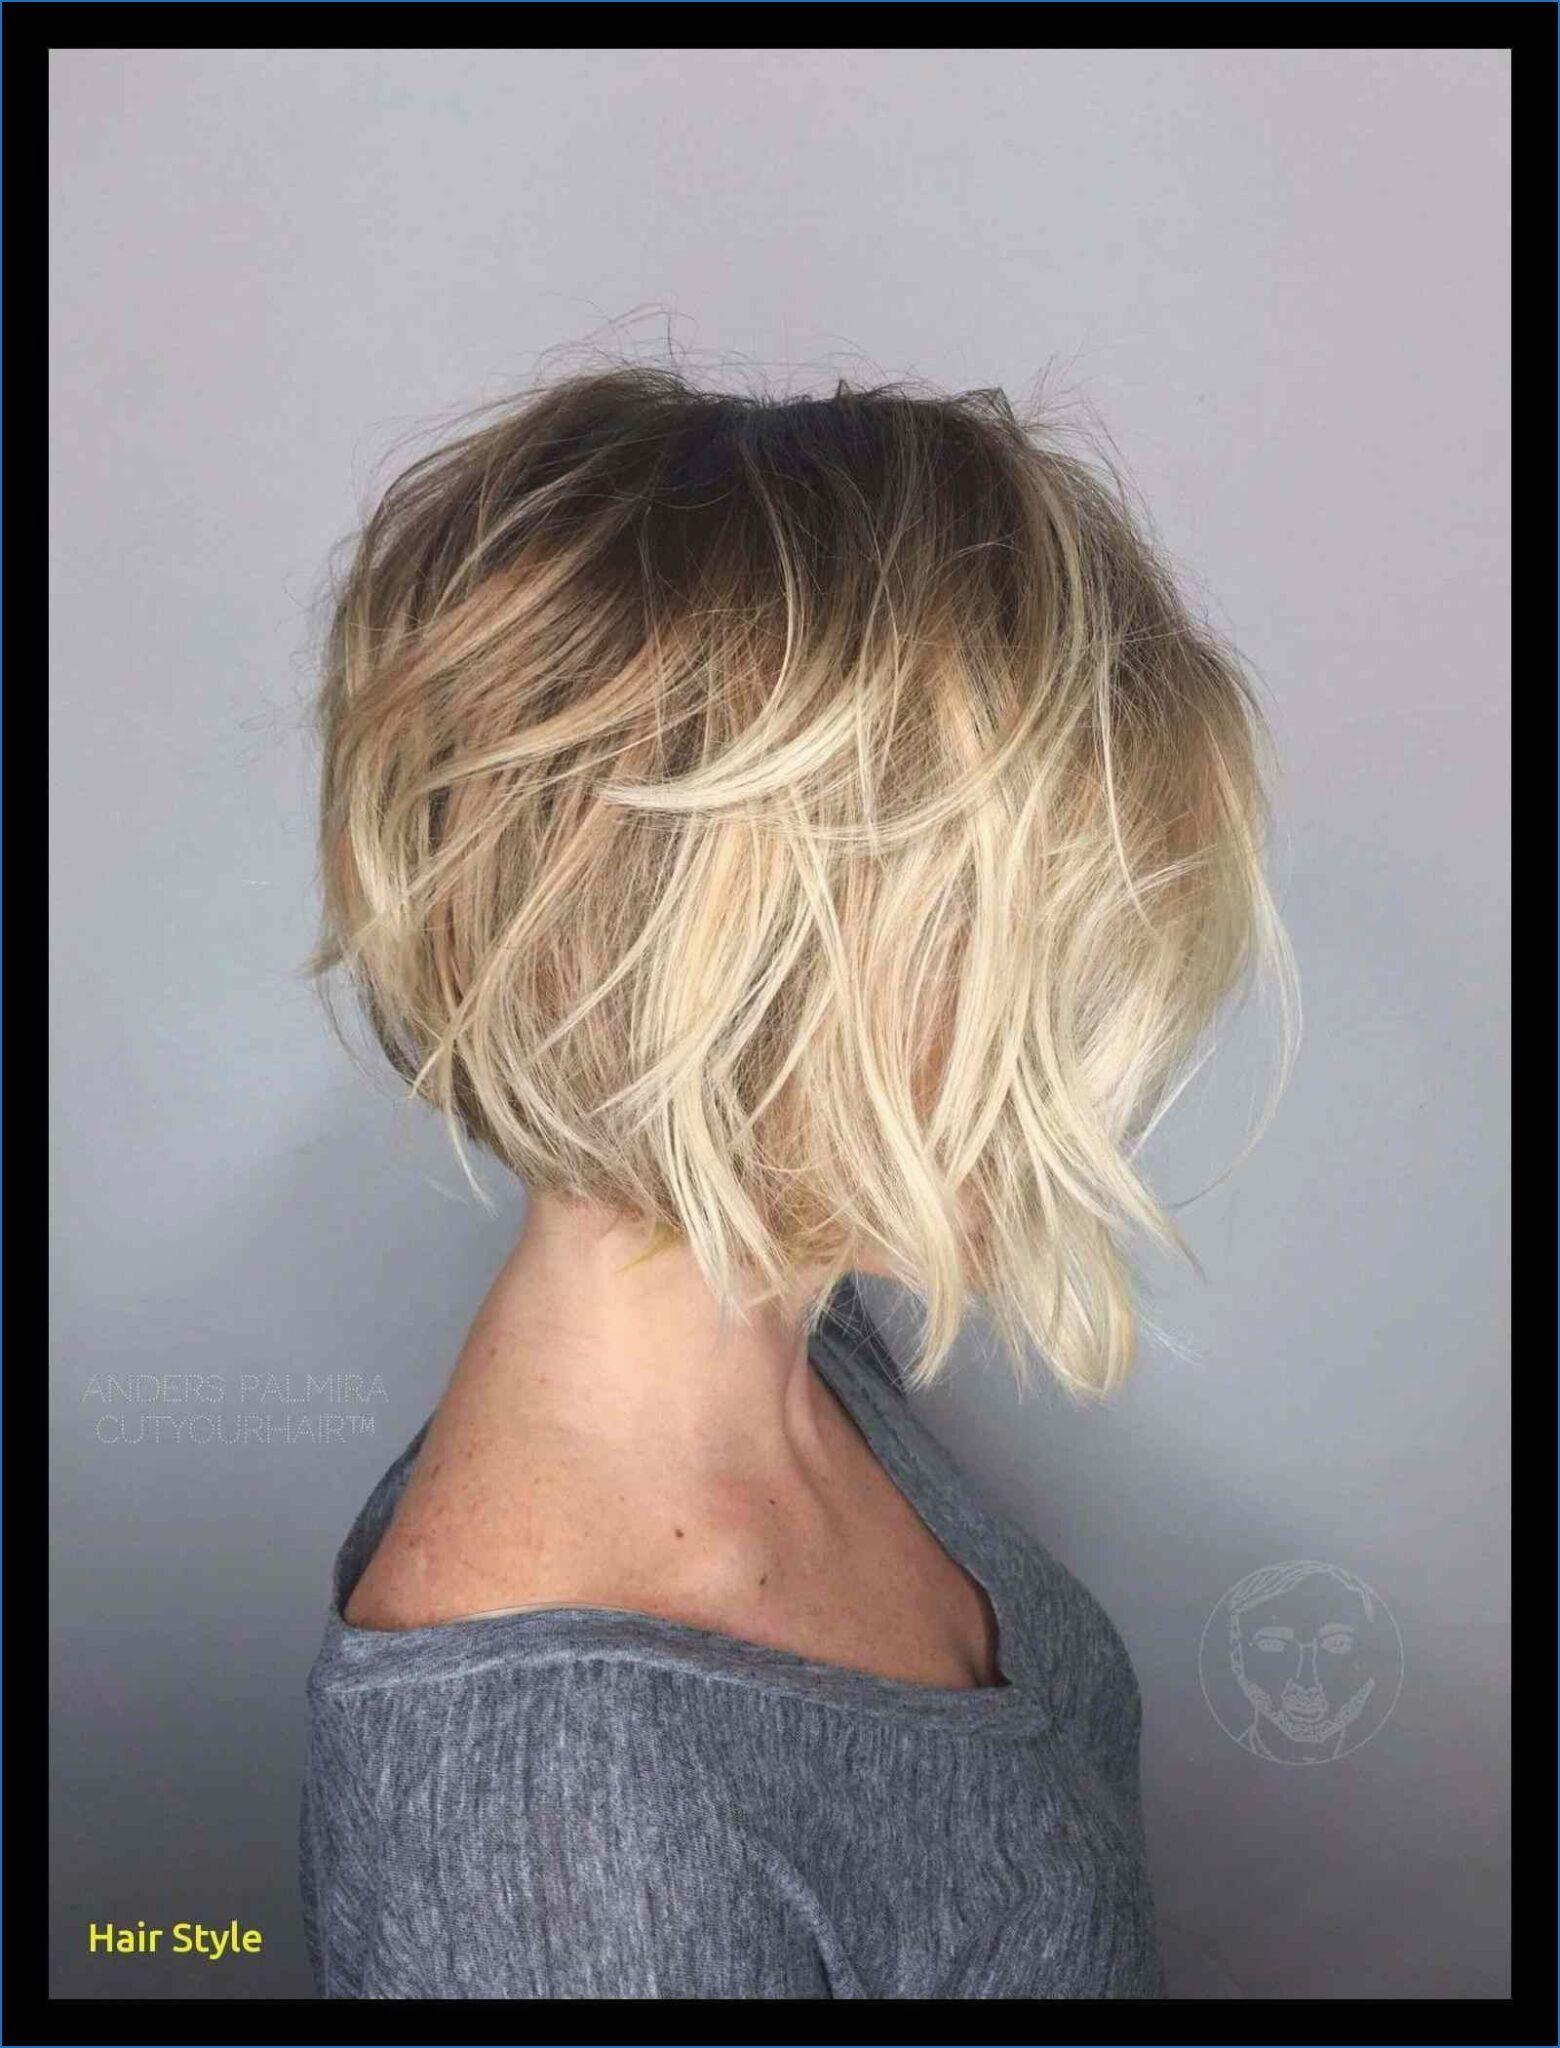 Frisuren Mittellang Frauen Coole Frisuren Frisuren Kurze Haare Stylen Kurzhaarfrisuren